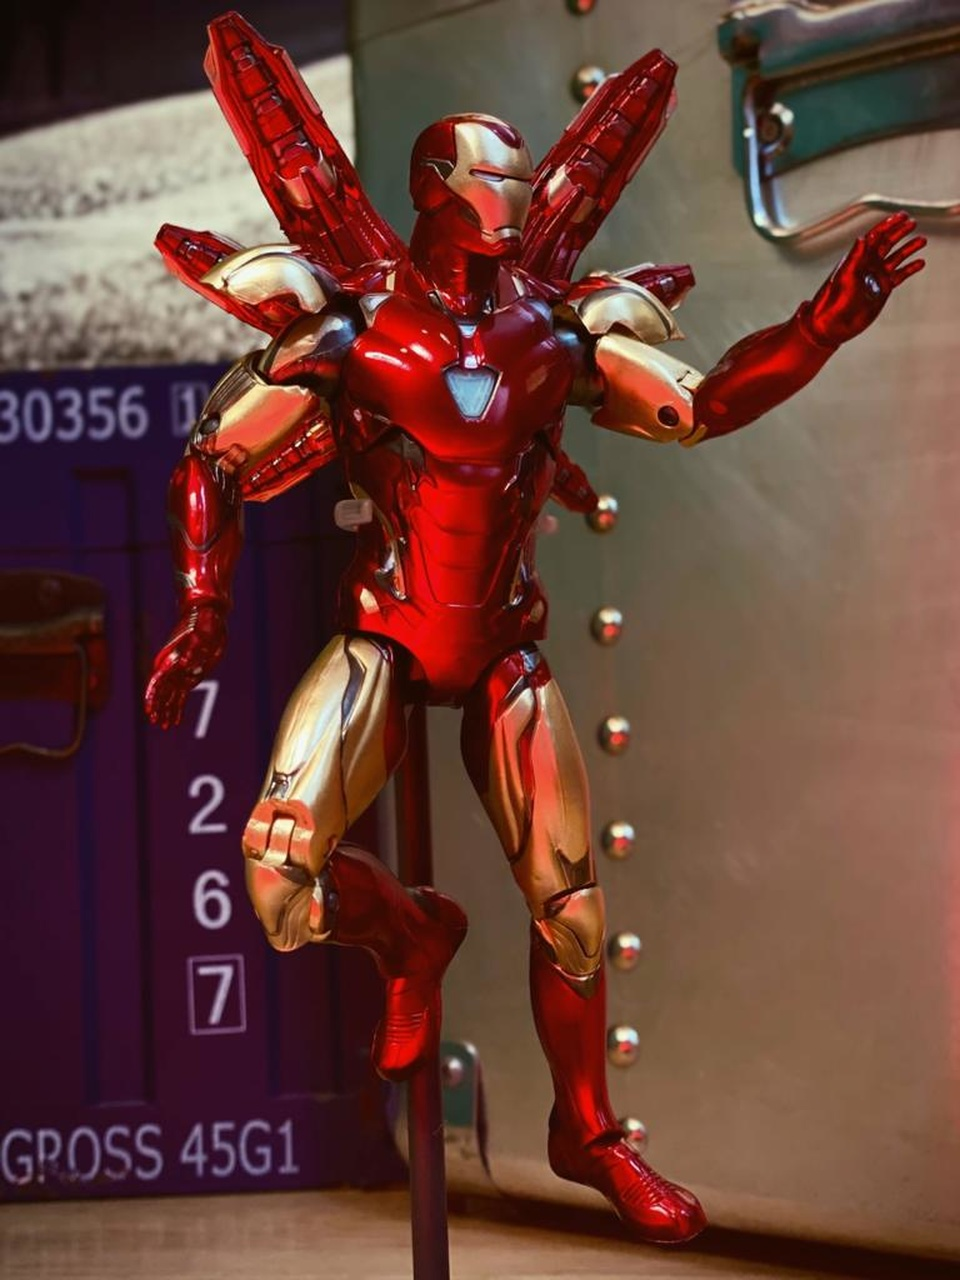 Action Figure Homem de Ferro Iron Man Mark 85: Vingadores Ultimato Avengers End Game